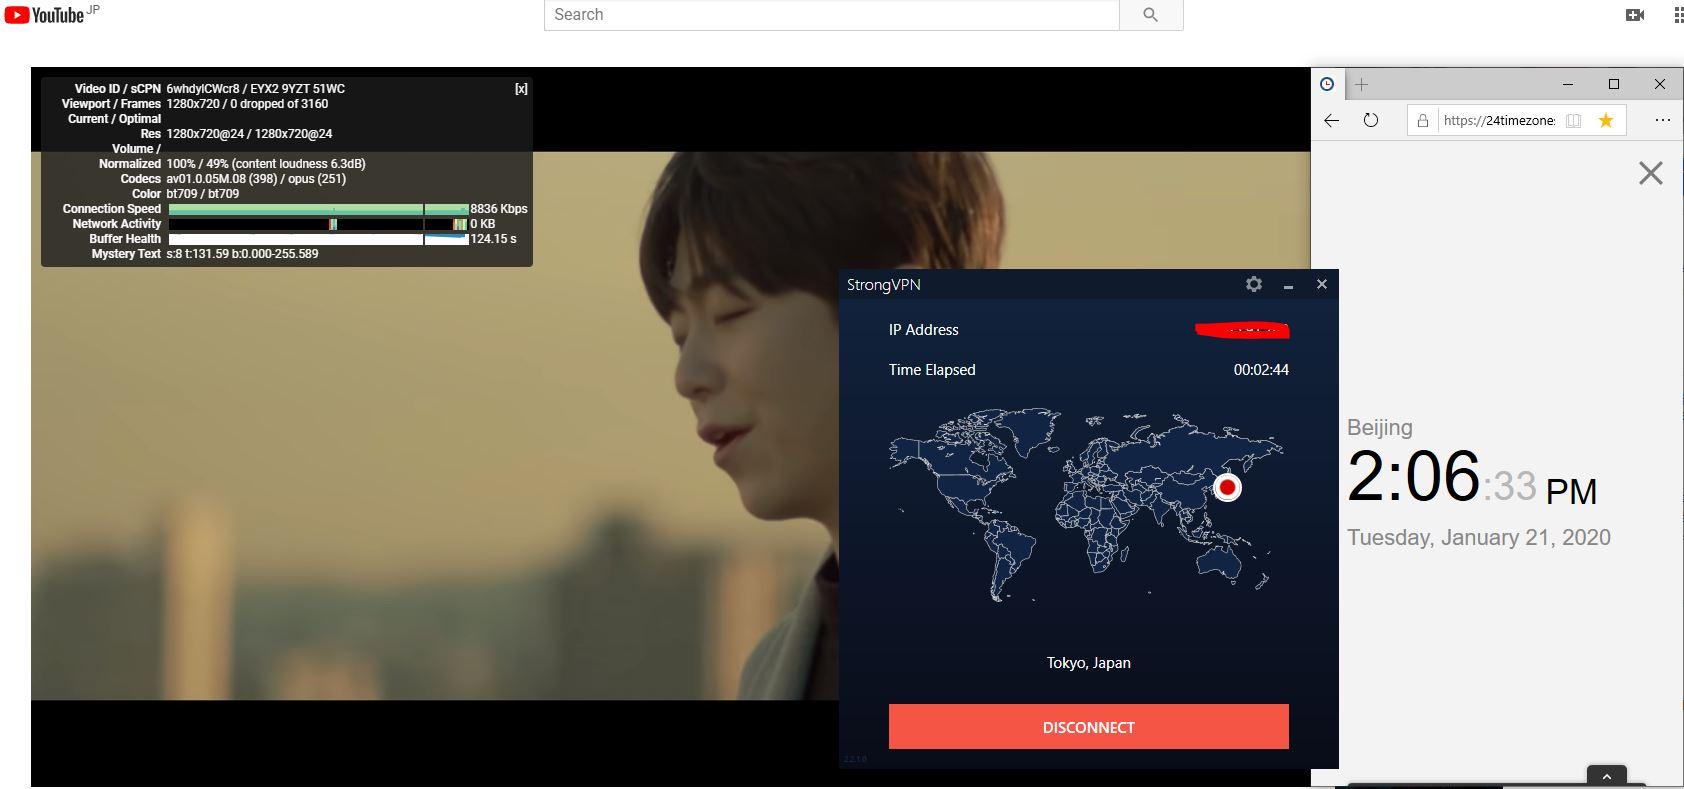 Windows10 StrongVPN Tokyo - Japan 中国VPN翻墙 科学上网 Youtube测速-20200121